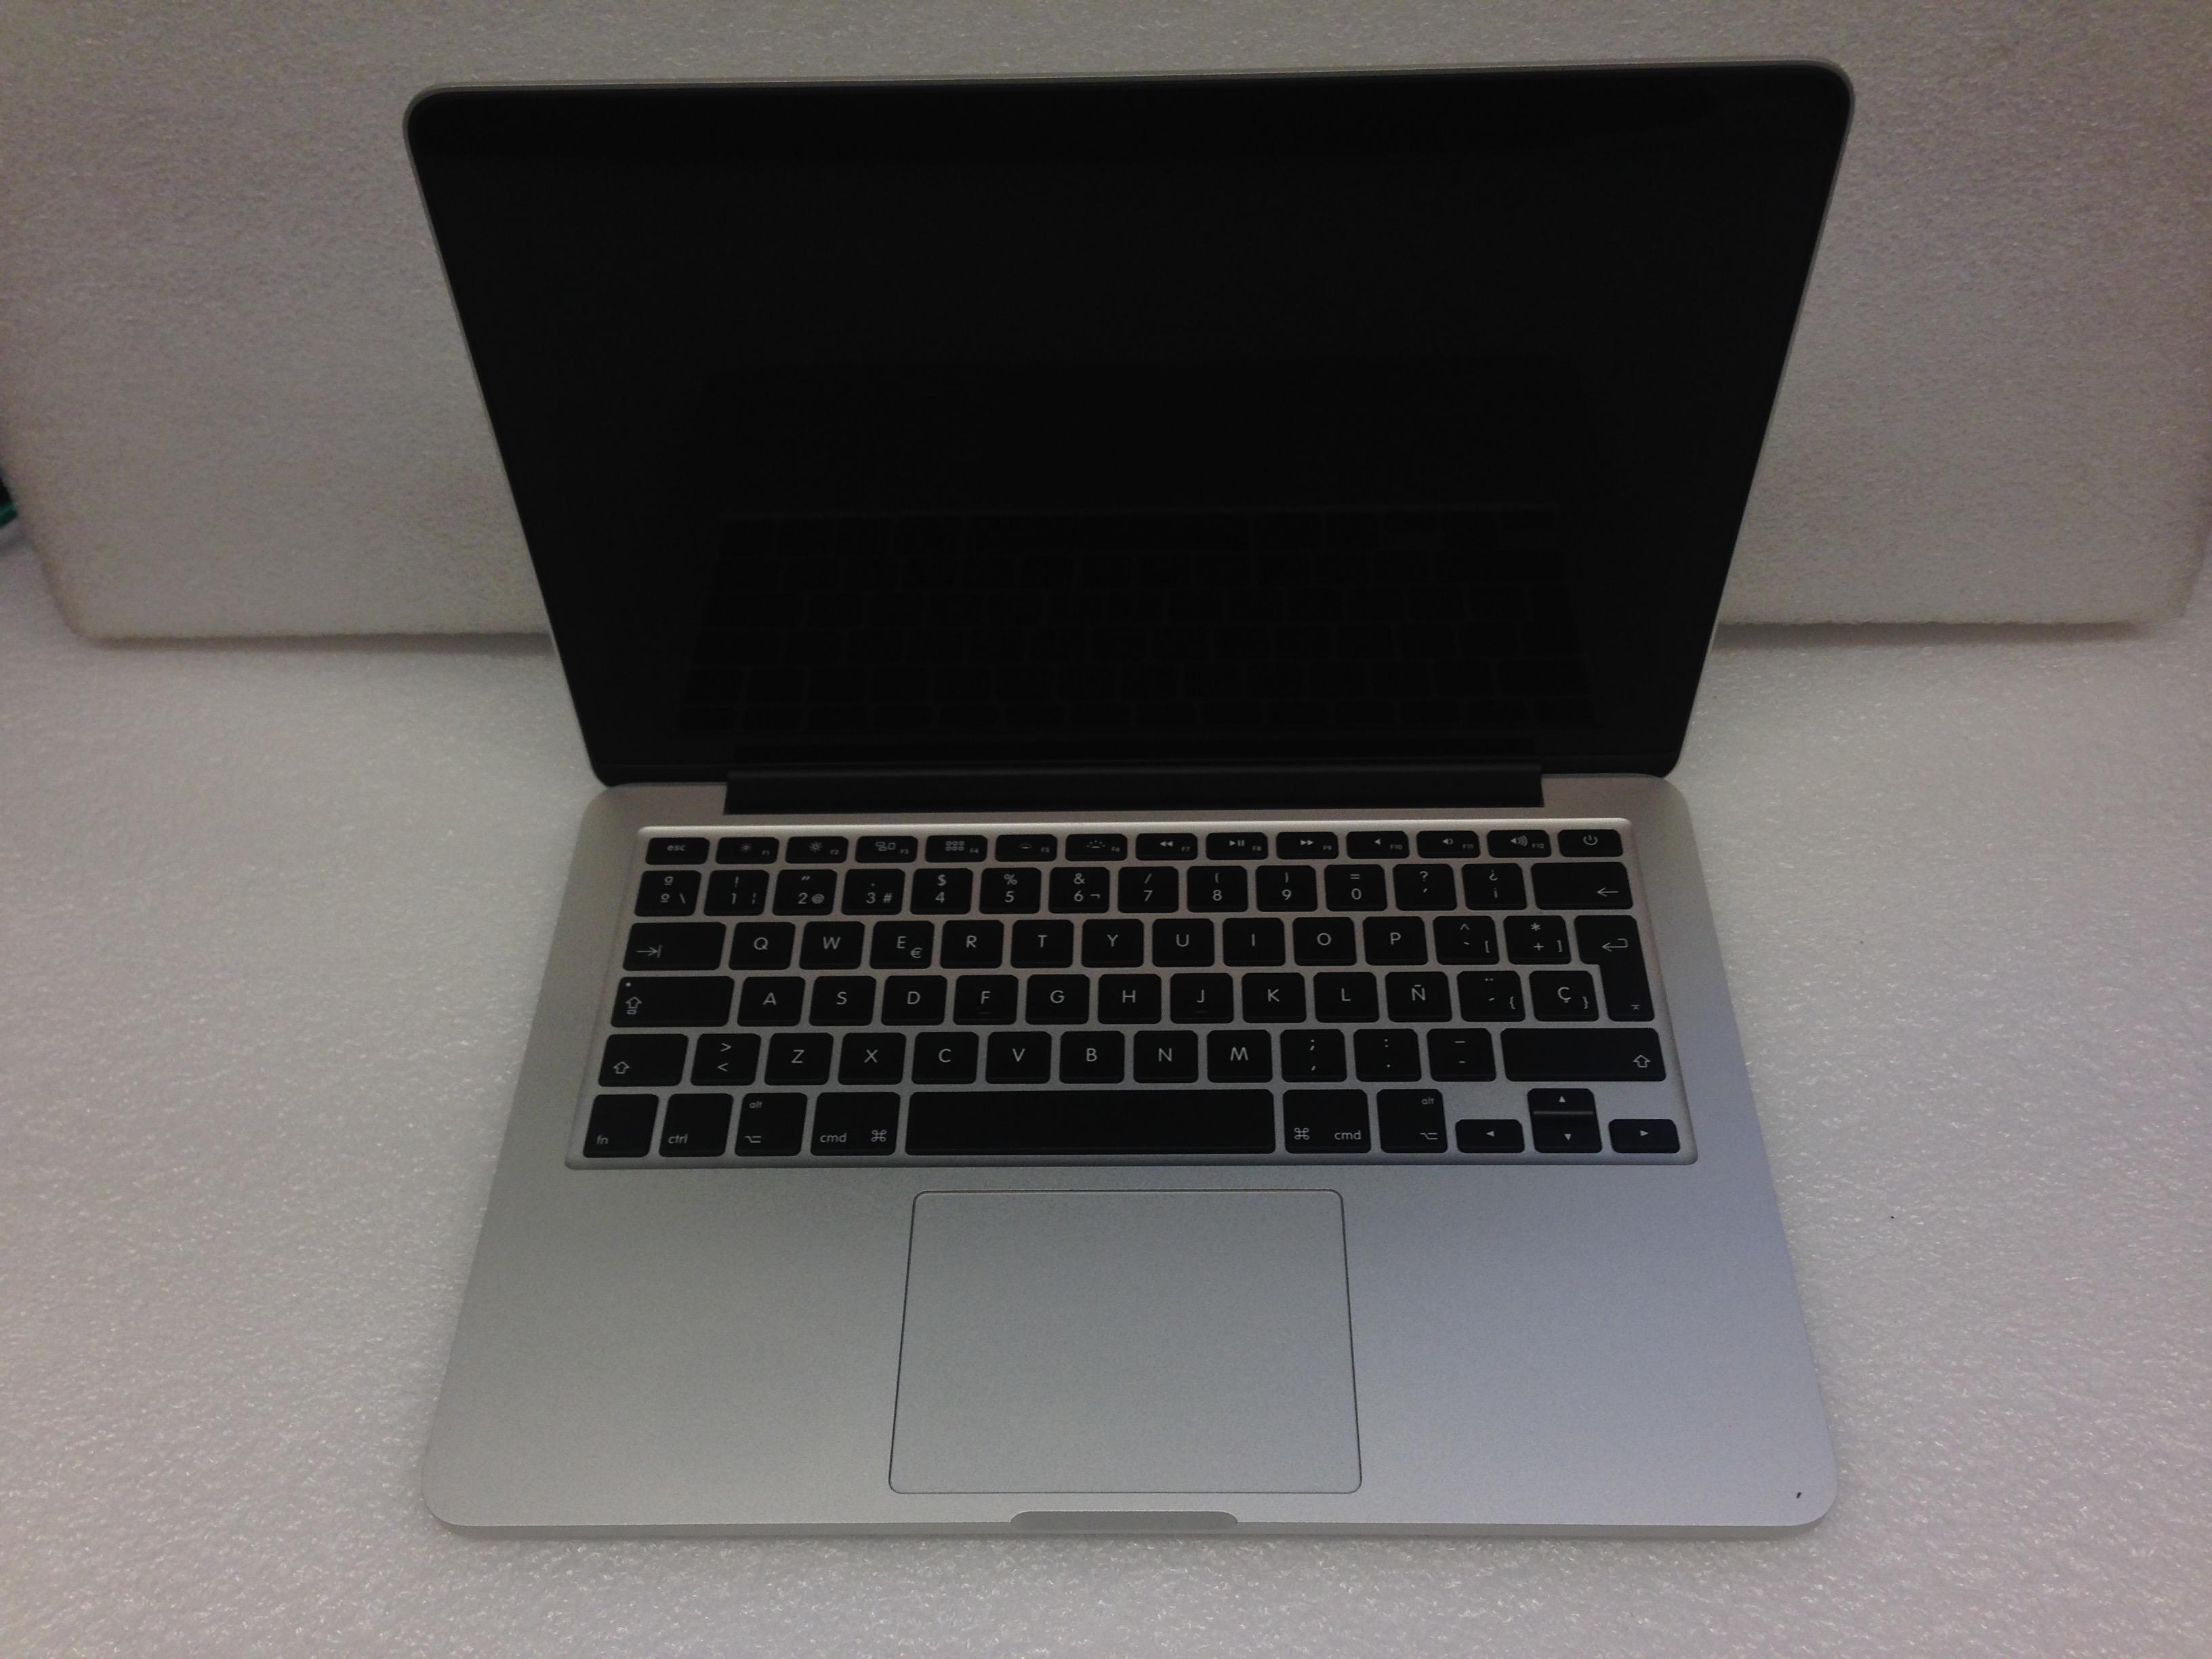 MacBook Pro (Retina 13-inch Mid 2014), DUAL CORE INTEL CORE i5 2,6 GHZ, 8 GB, SSD 128GB, imagen 1